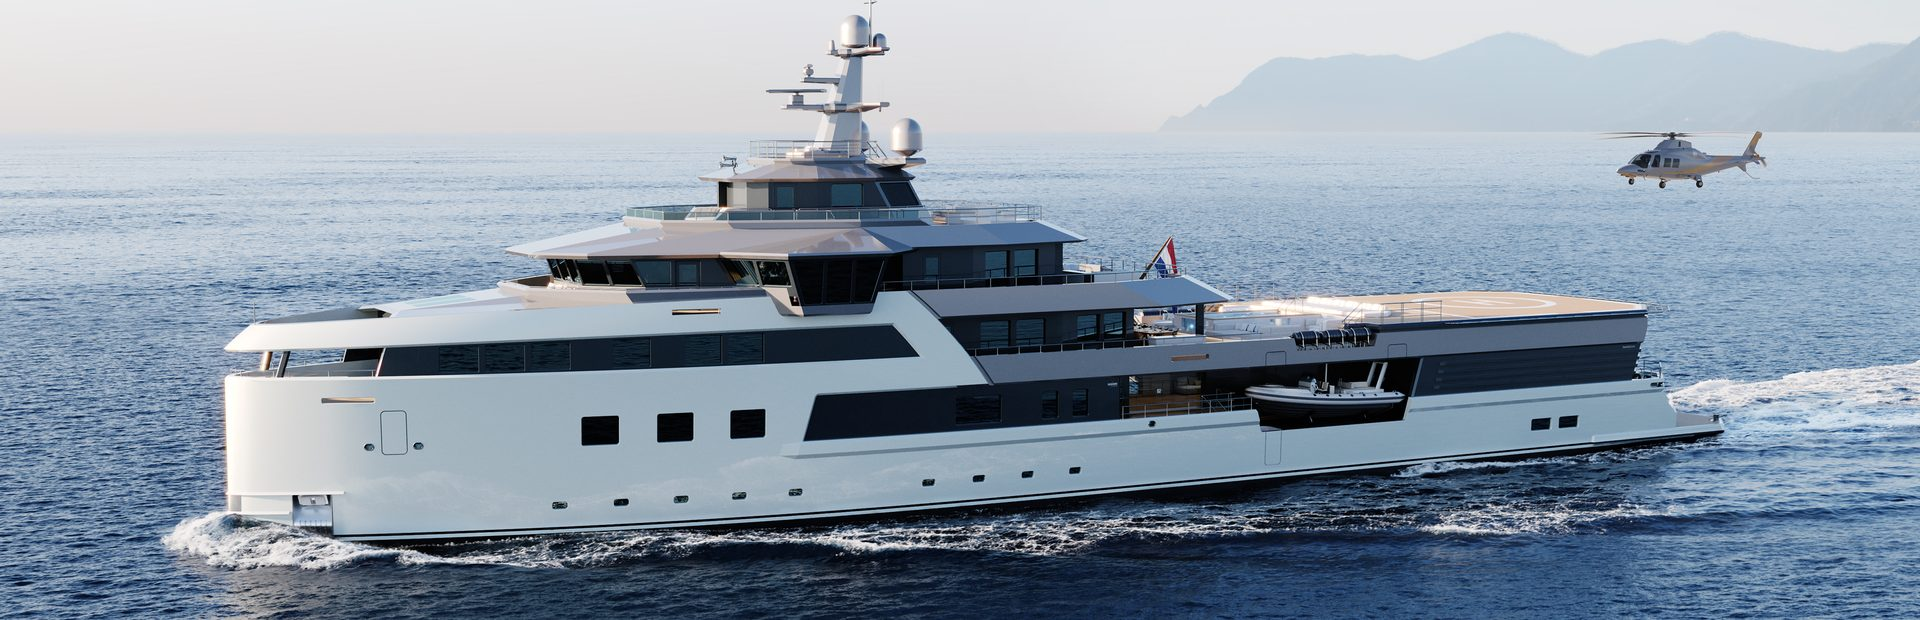 SeaXplorer 77 Yacht Charter